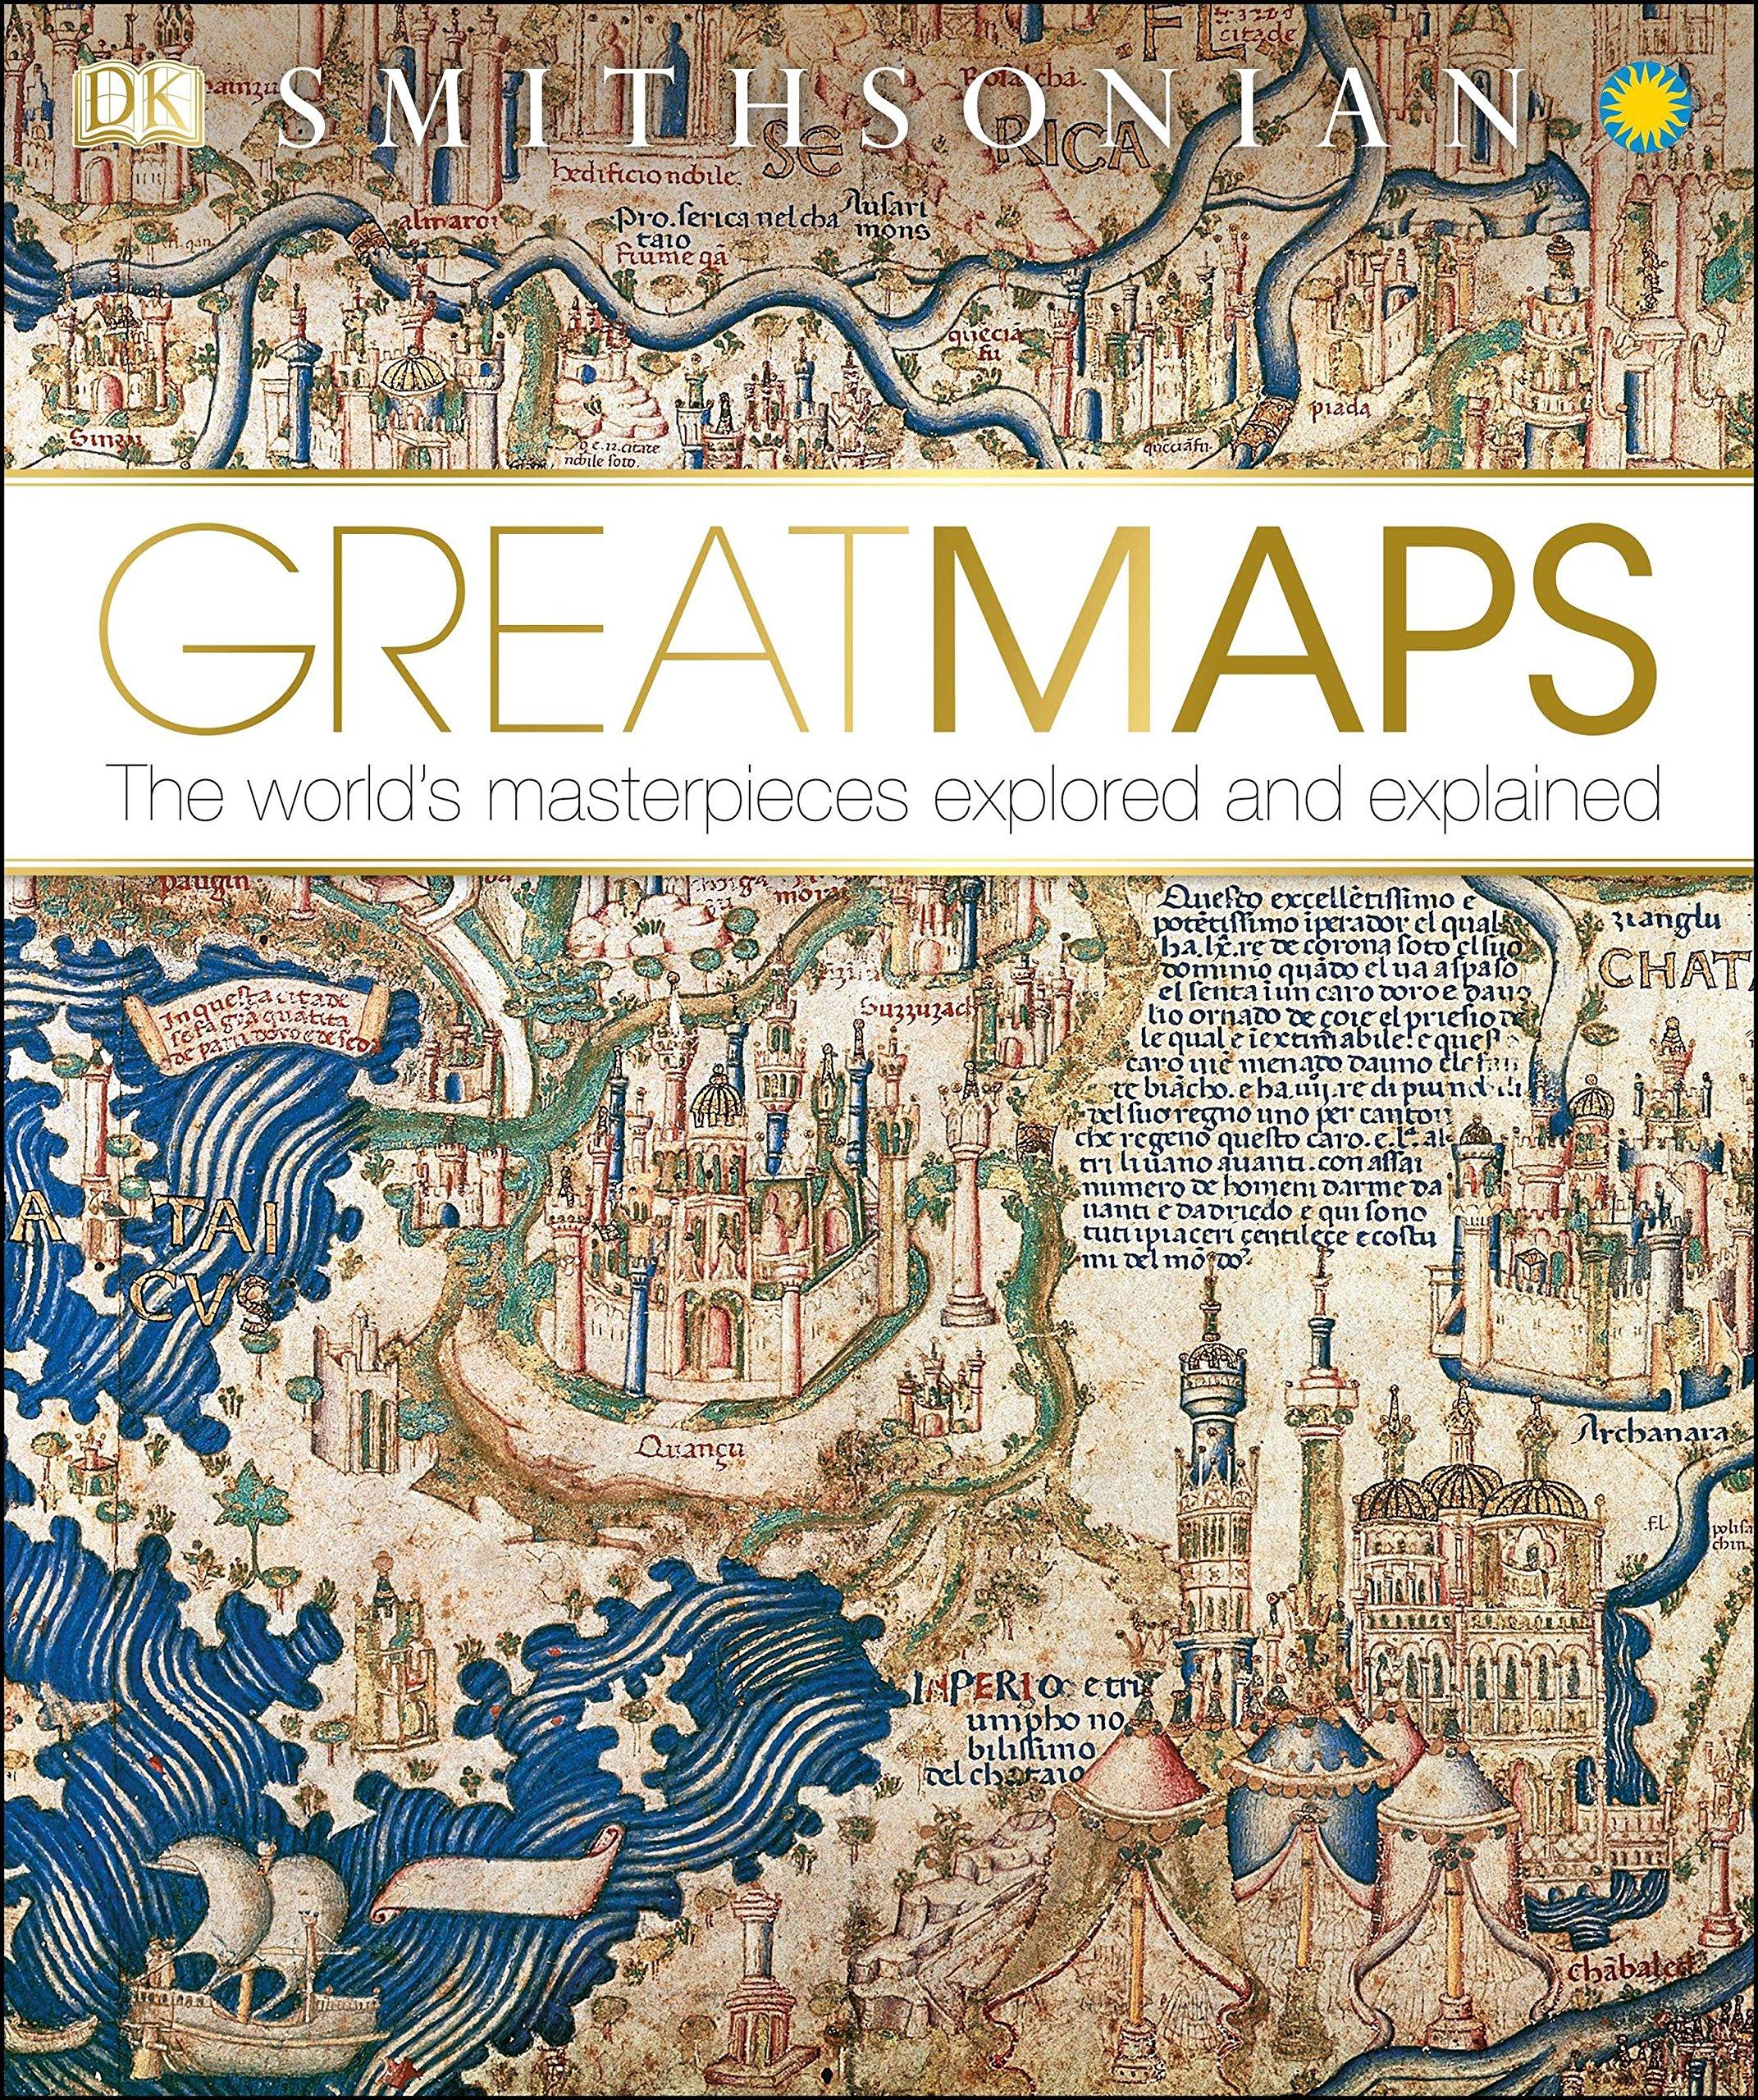 Smithsonian: Great Maps (Dk Smithsonian)